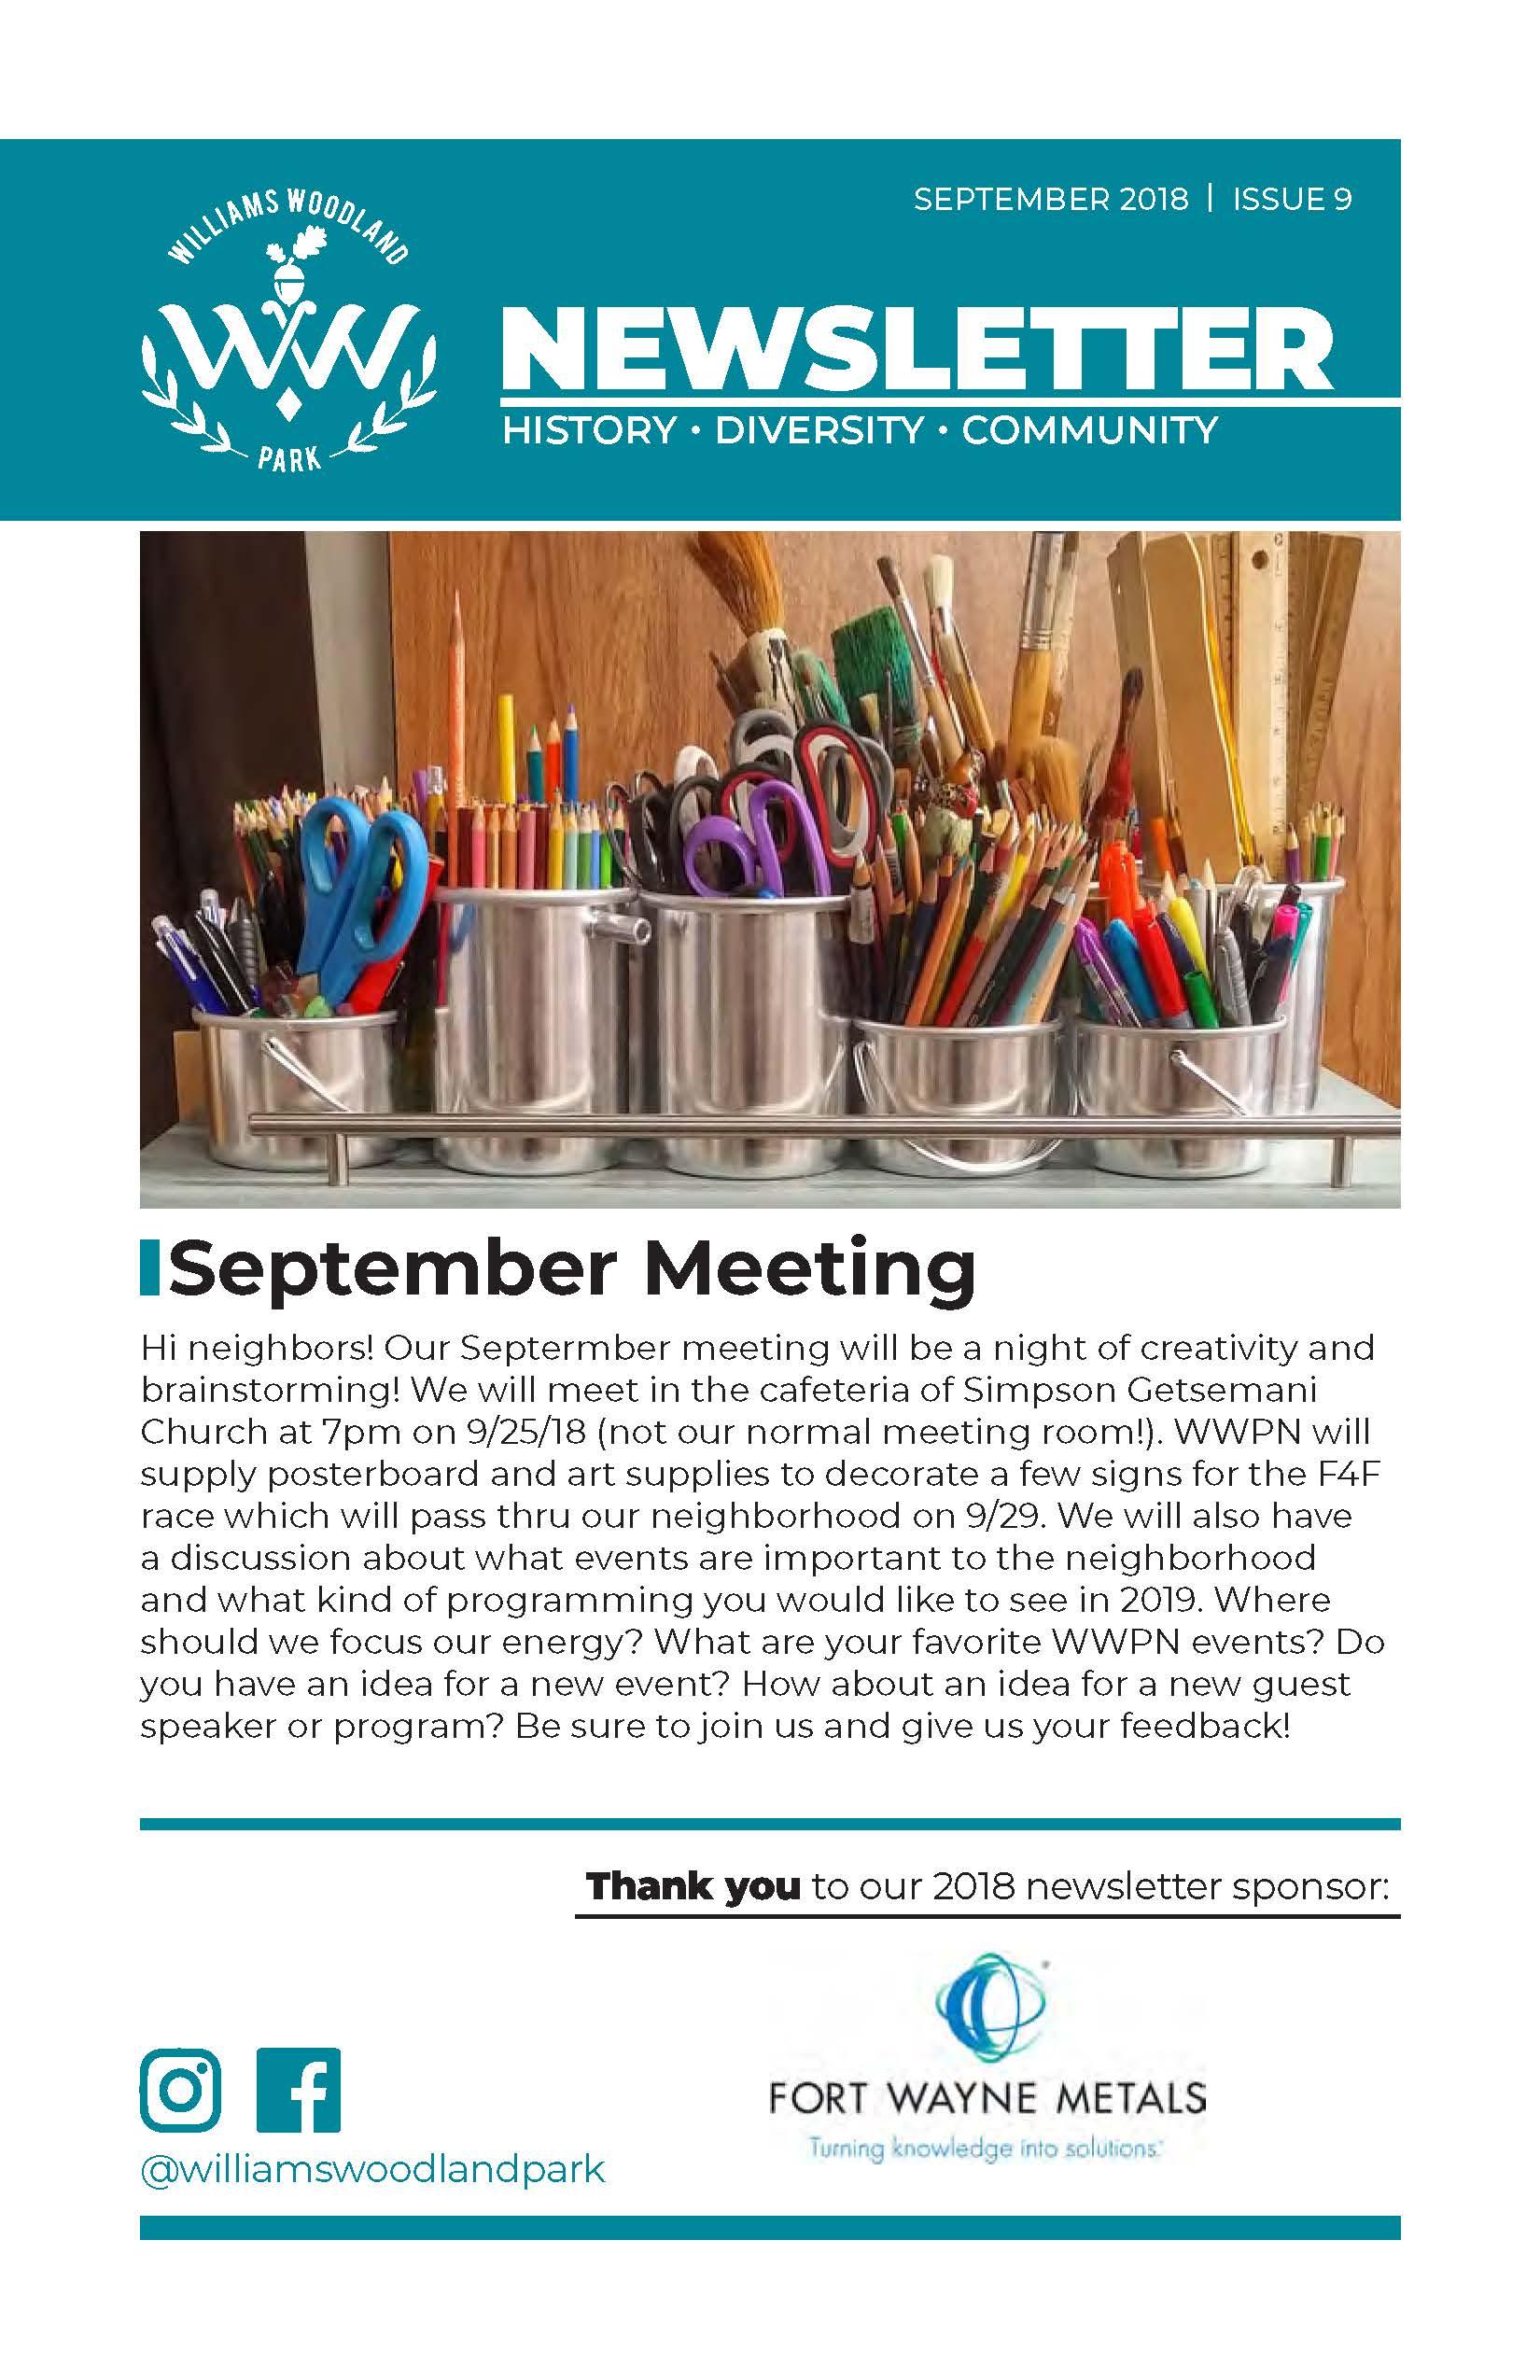 WWPN_Newsletter_Sept2018_spreads_Page_1.jpg